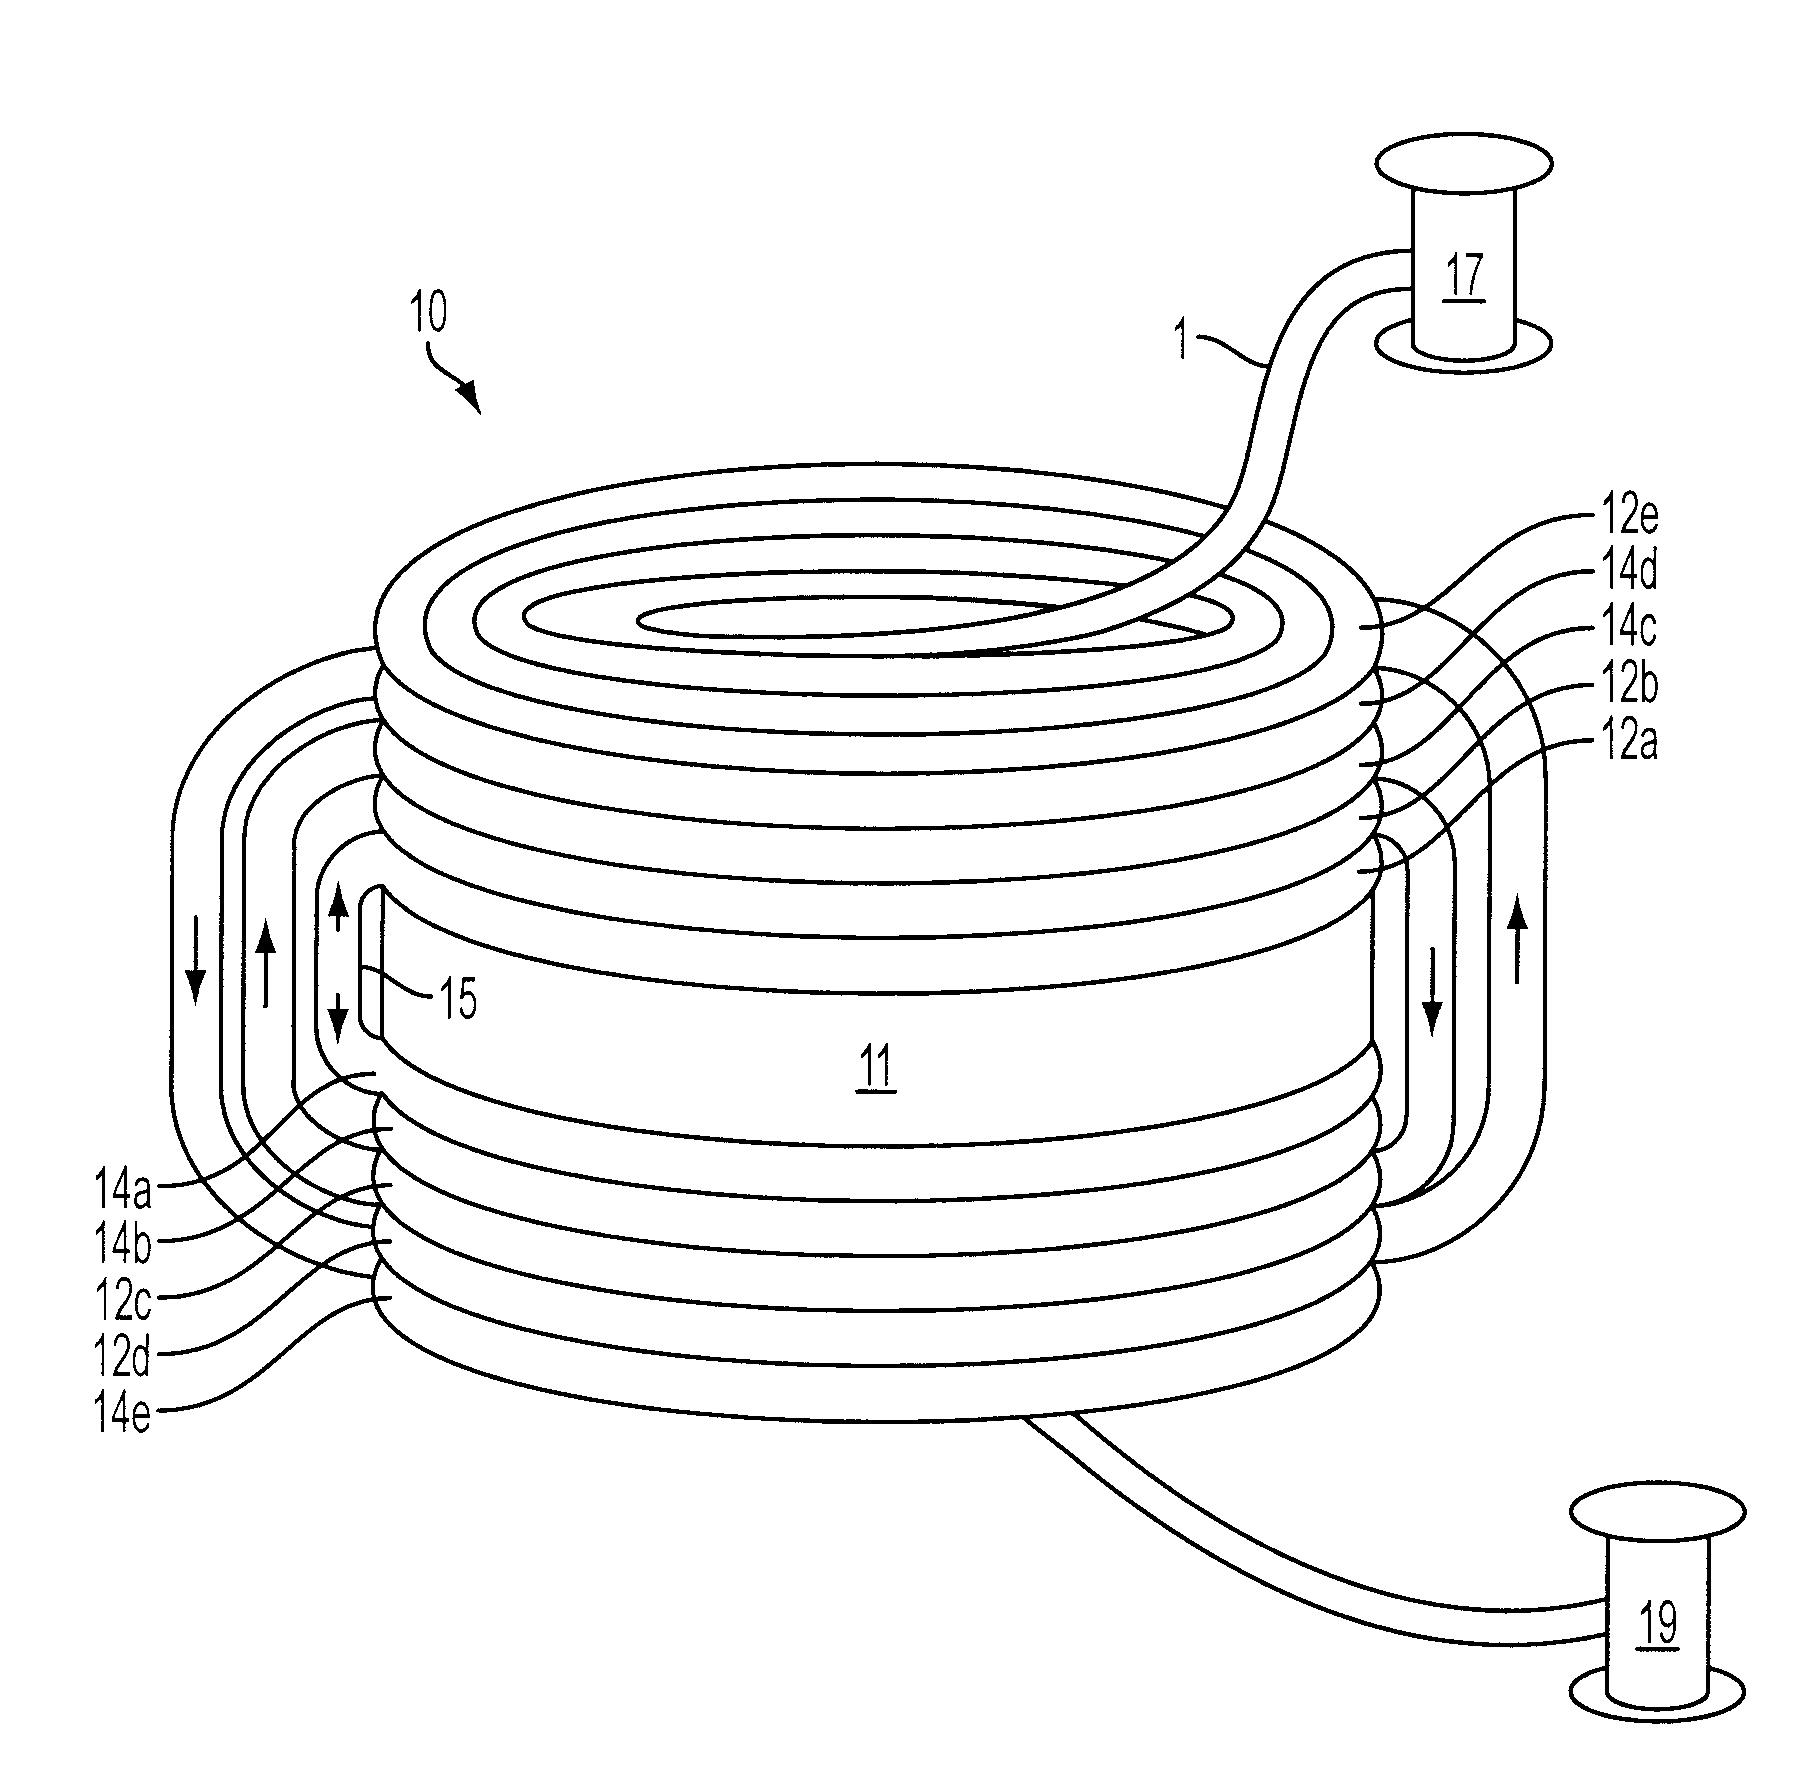 patent us20080130010 - crossover-free fiber optic coil sensor and winding method